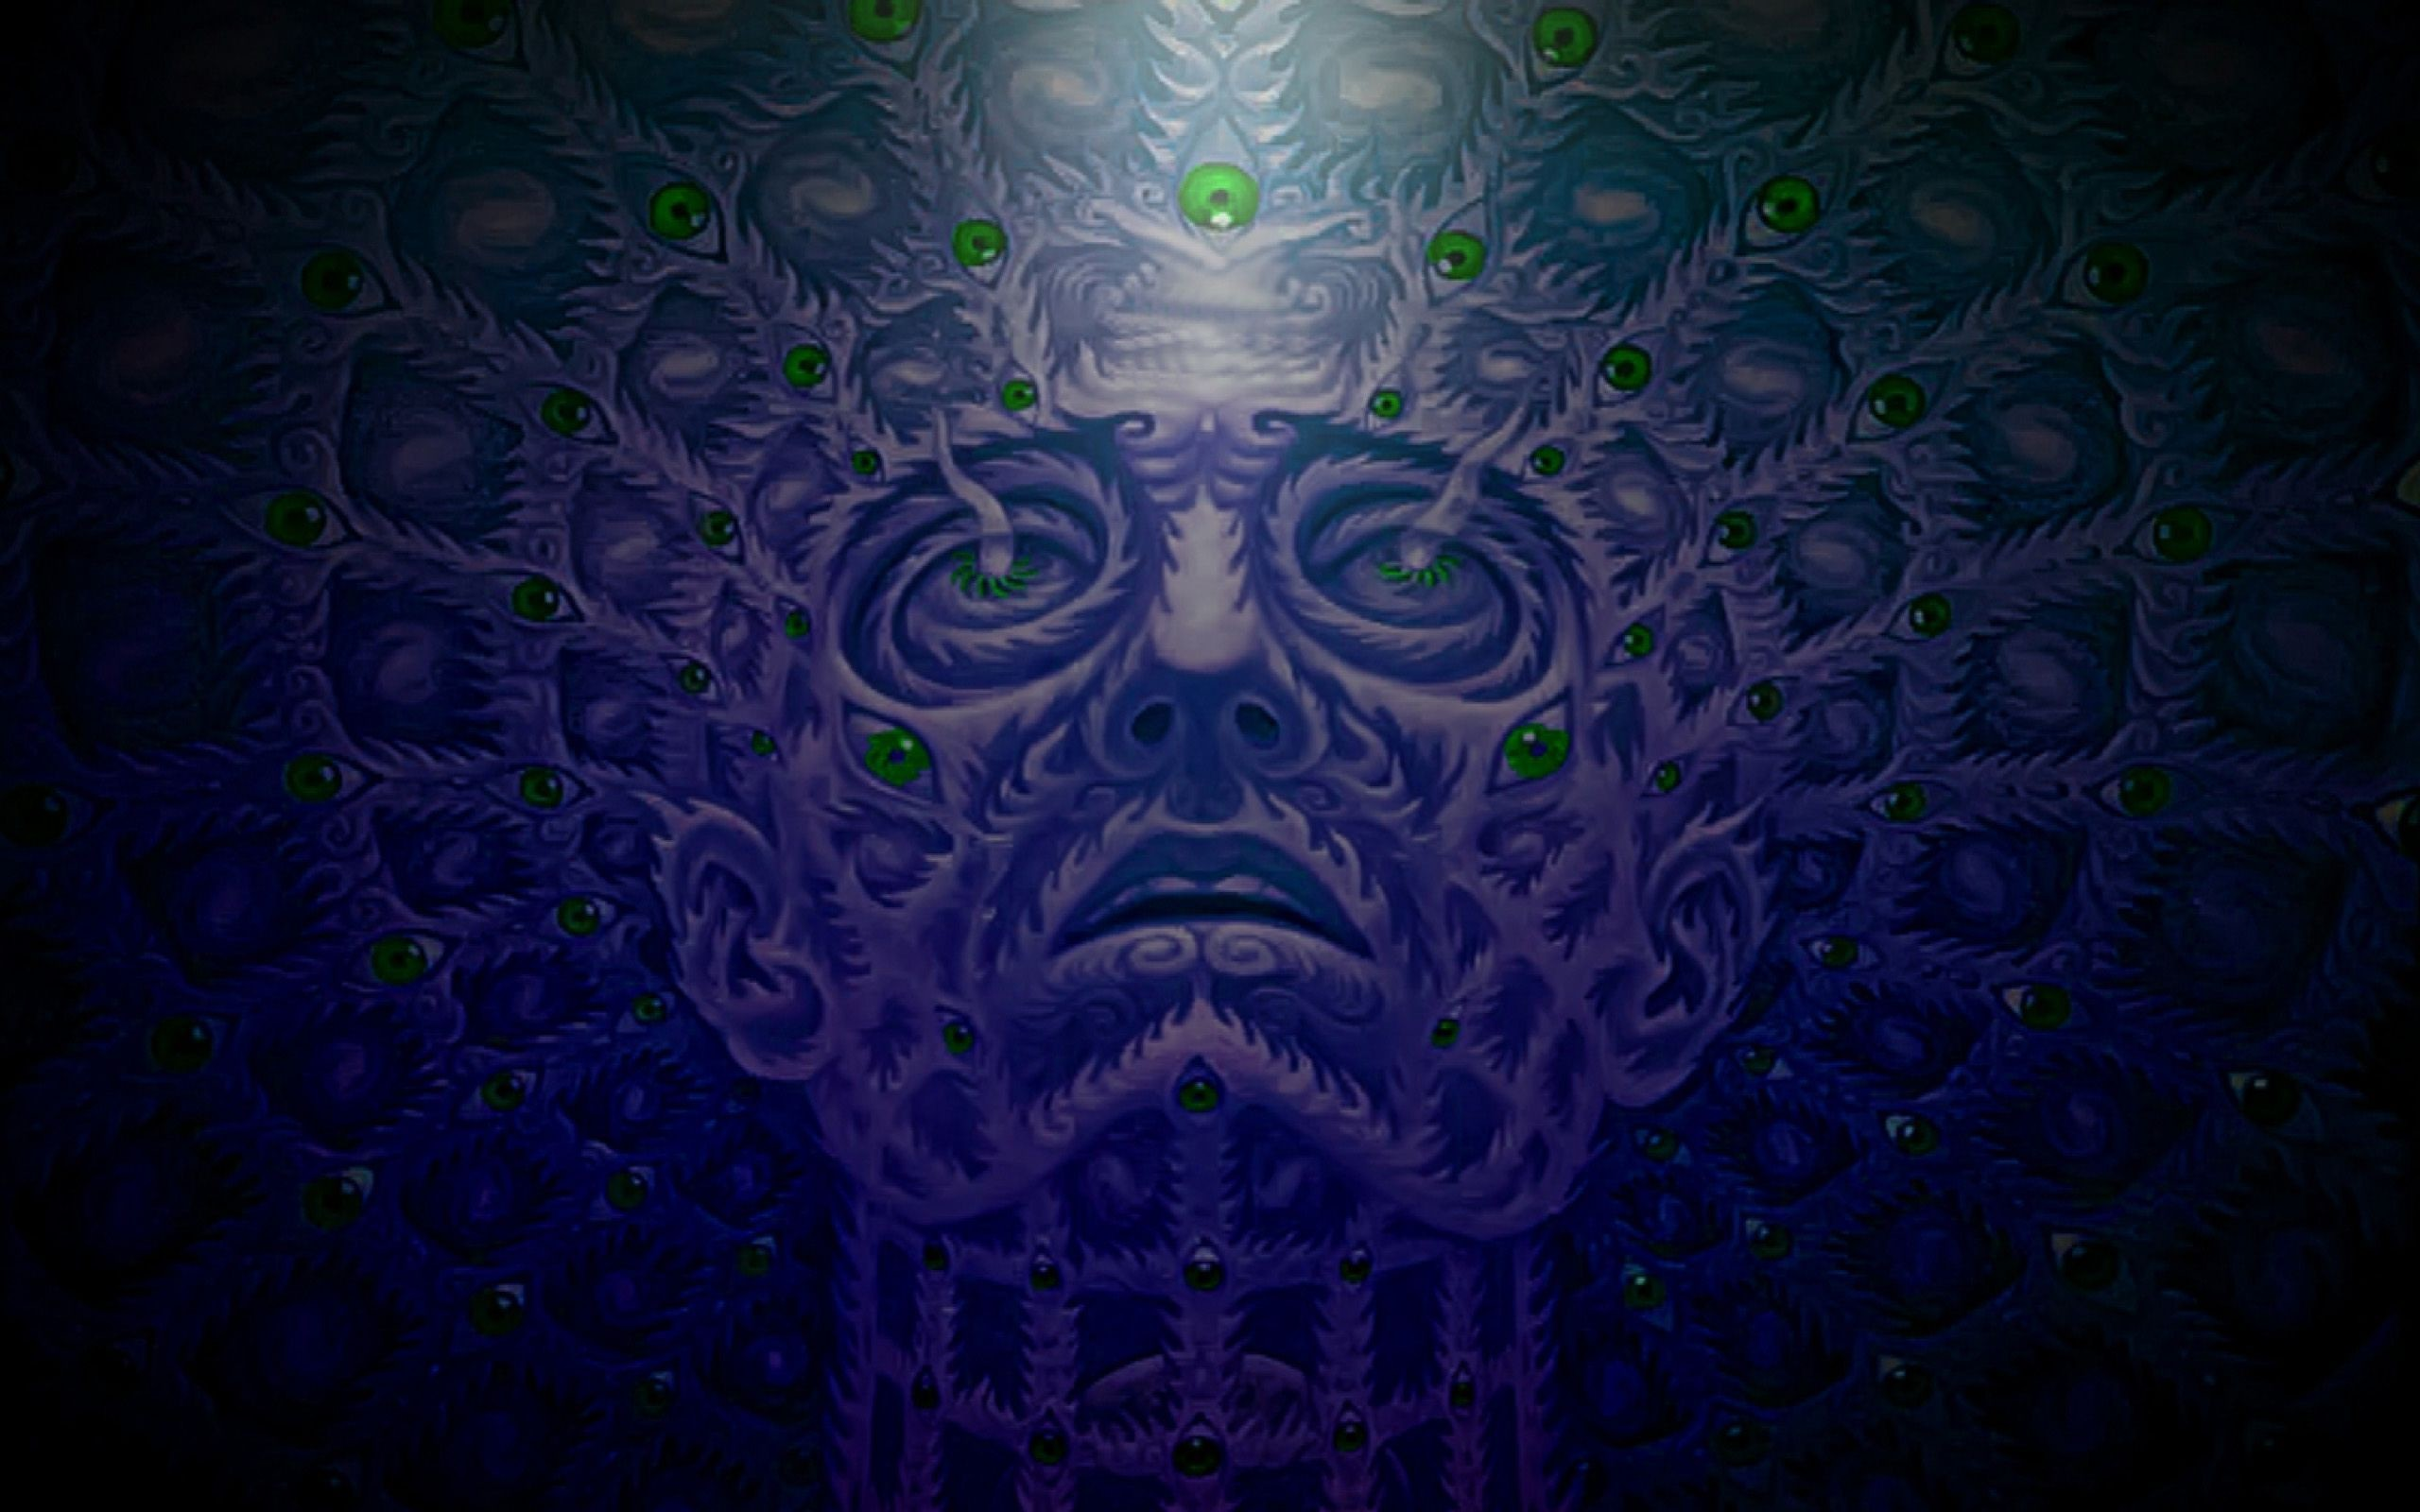 Artwork-Alex-Grey-Desktop-Wallpapers.jpg